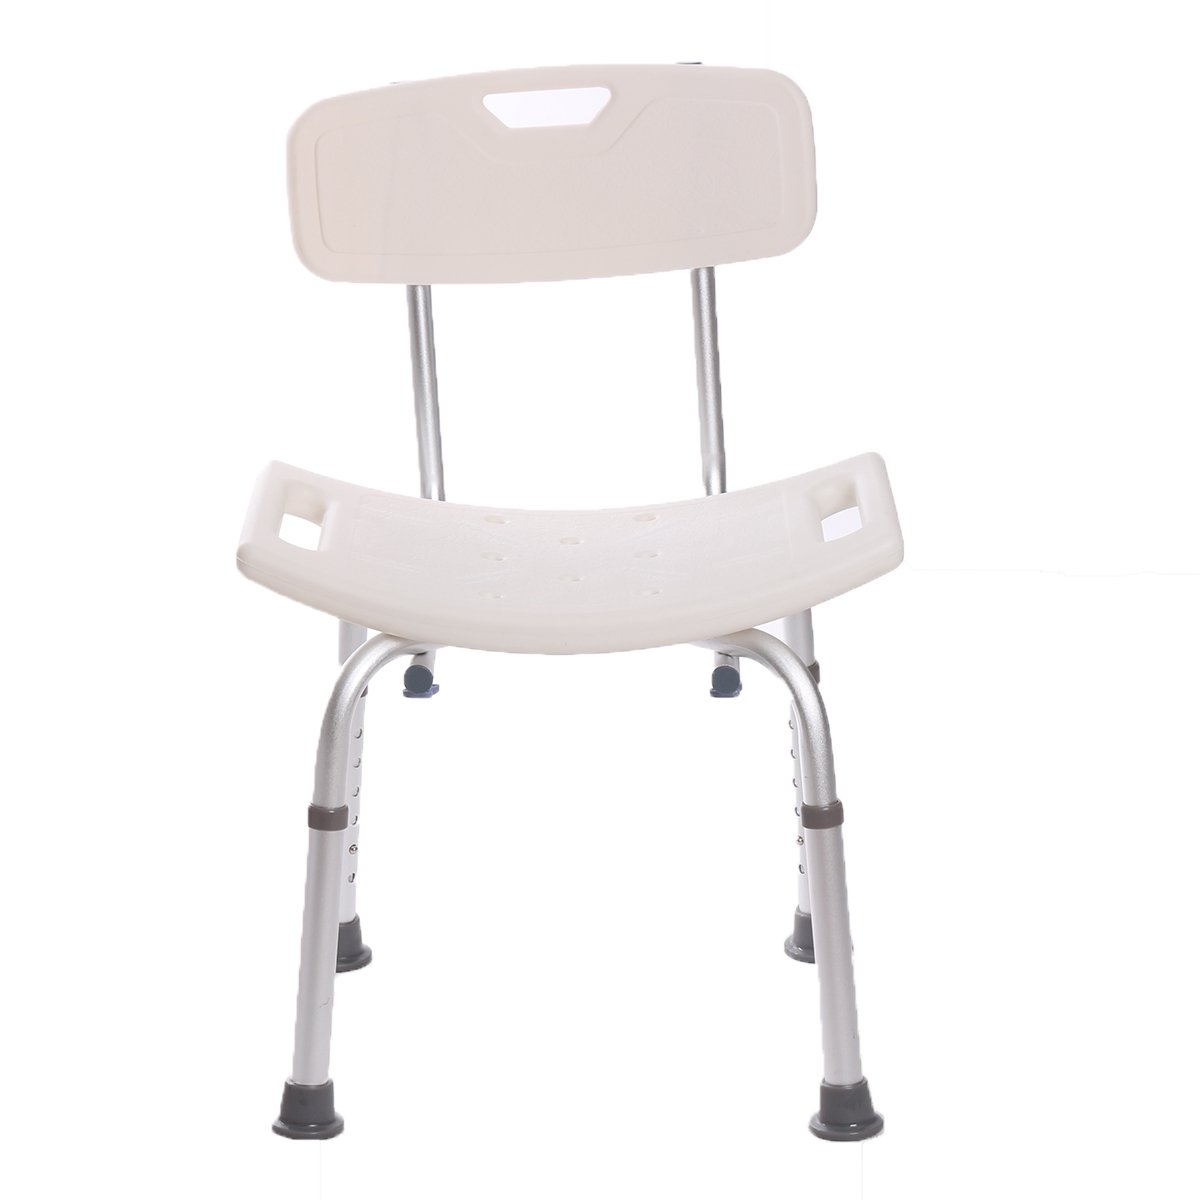 Aluminium Bath Shower Seat Stool Chair Adjustable Height Mobility Disability Aid 300 lb. Elderly Medical Bath Tub Shower Seat disability